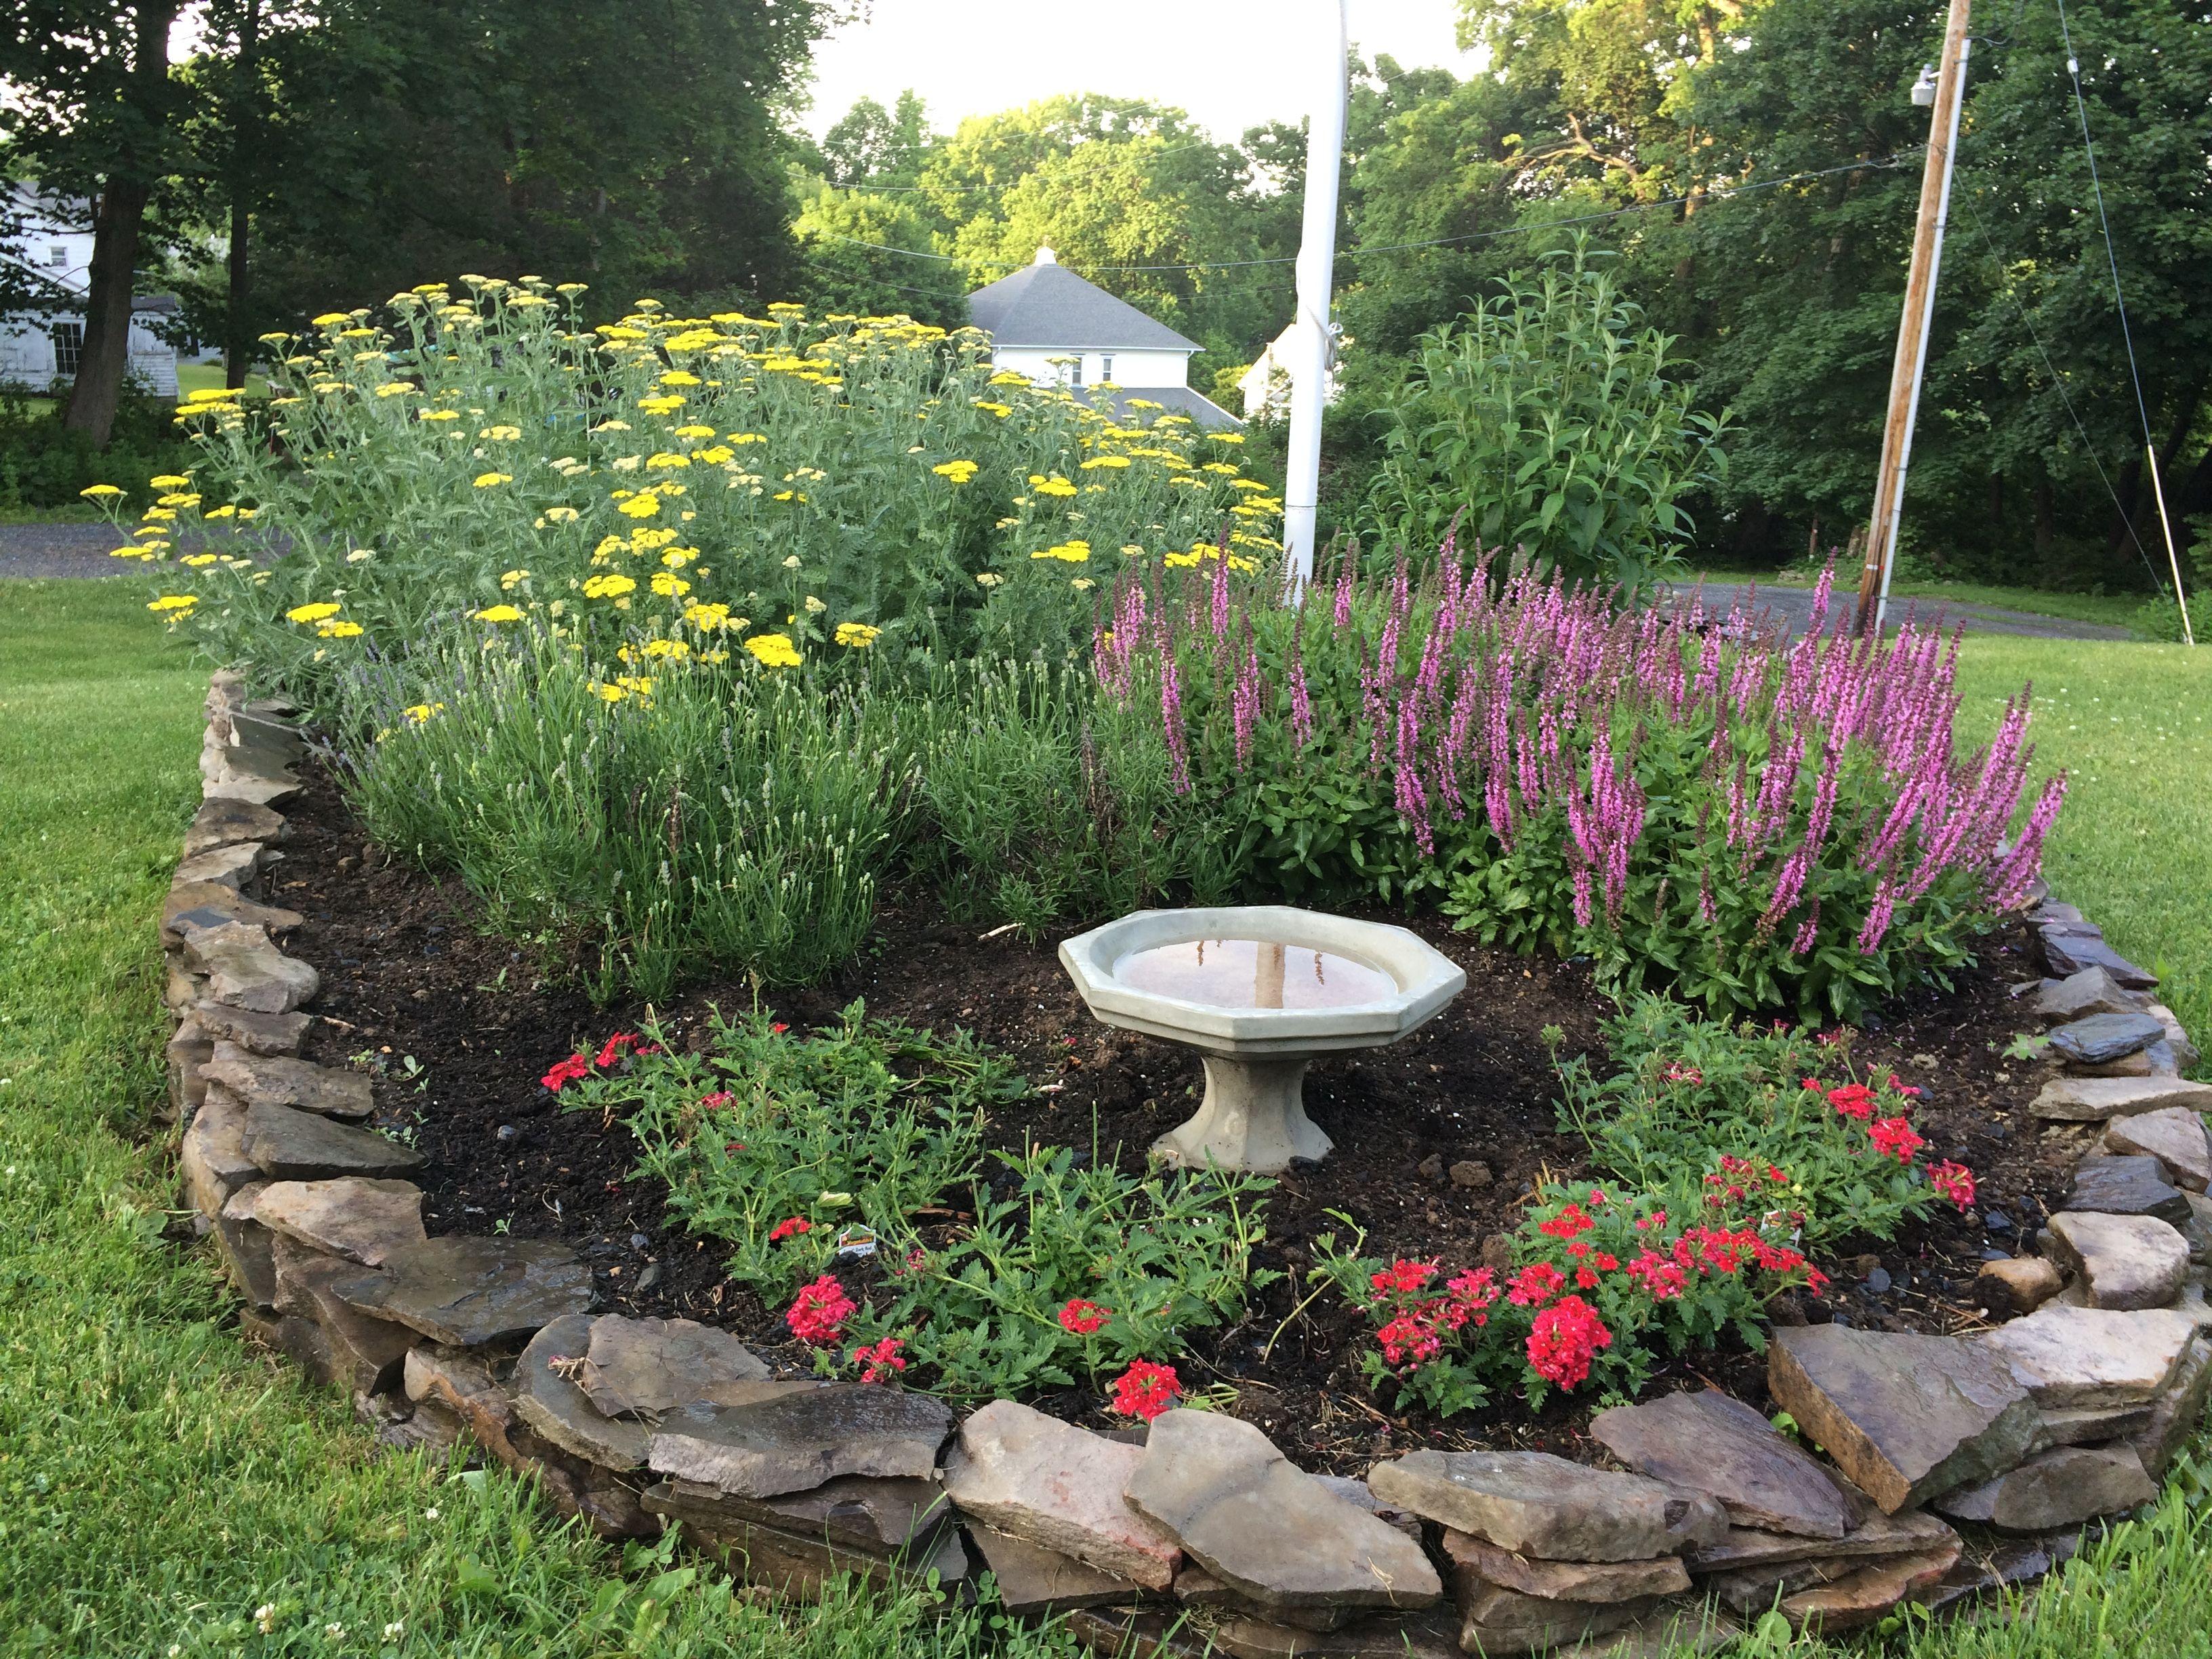 Flag Pole Garden Flag Pole Landscaping Landscaping With Rocks Front Yard Landscaping Design